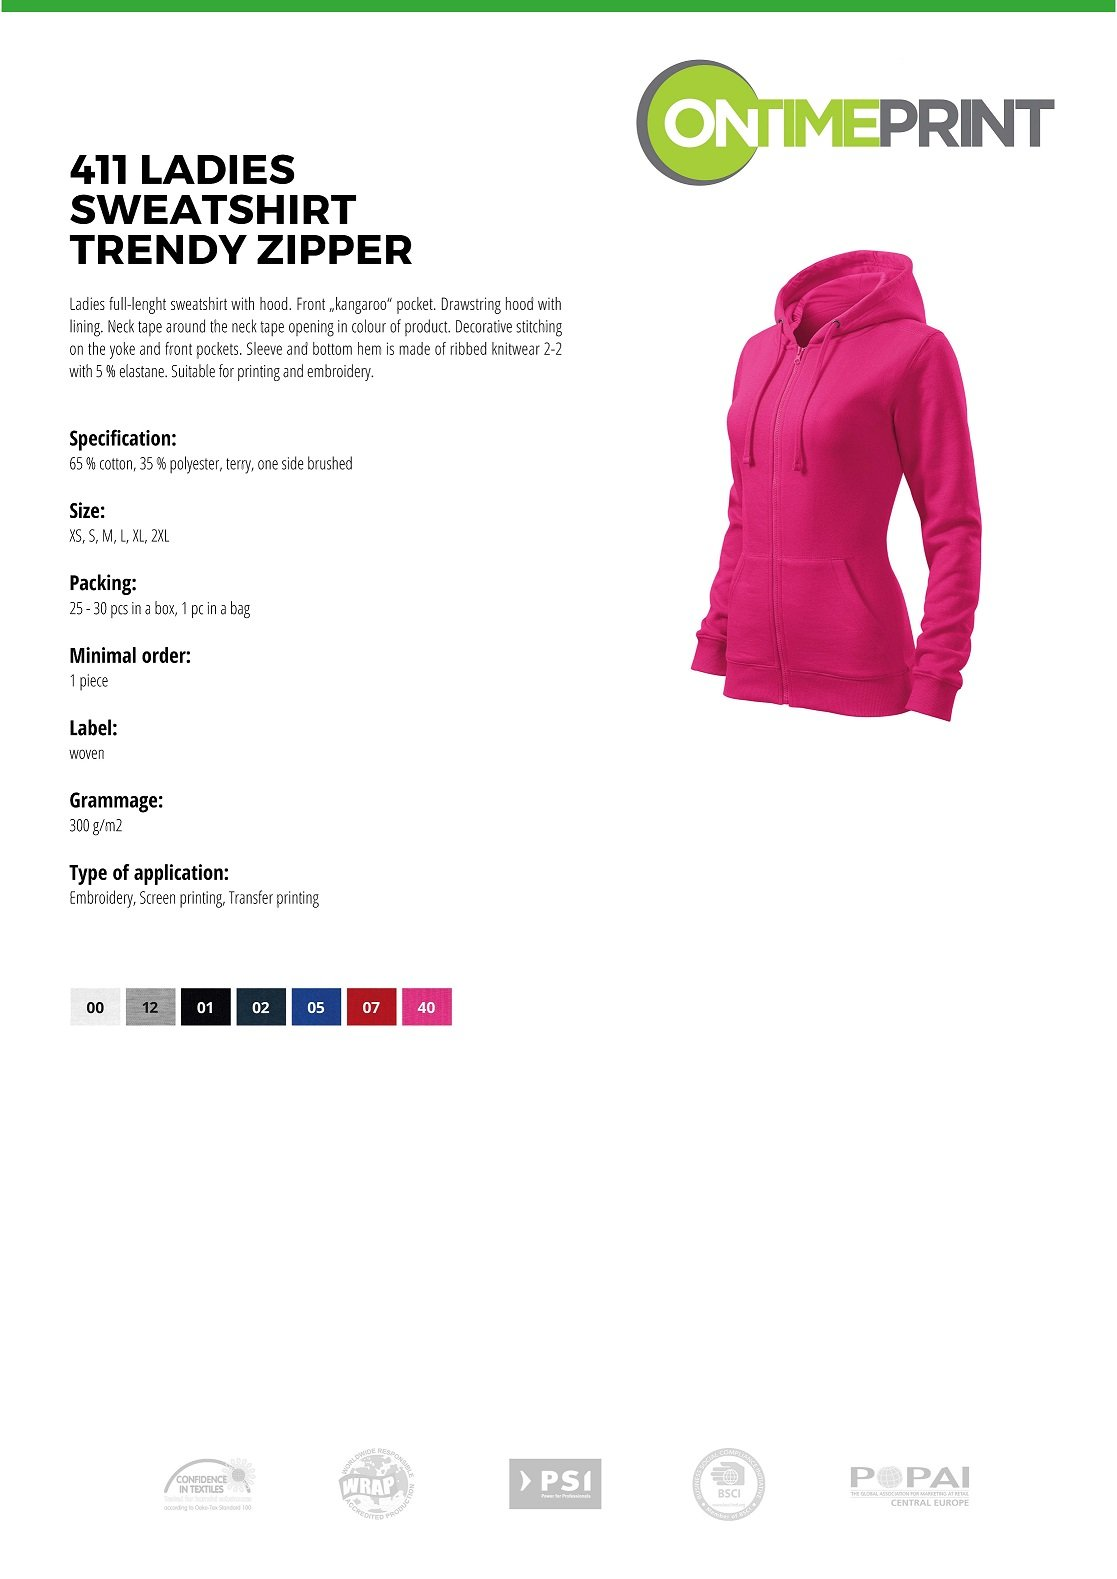 Ladies Zipped Sweatshirt Trendy 411